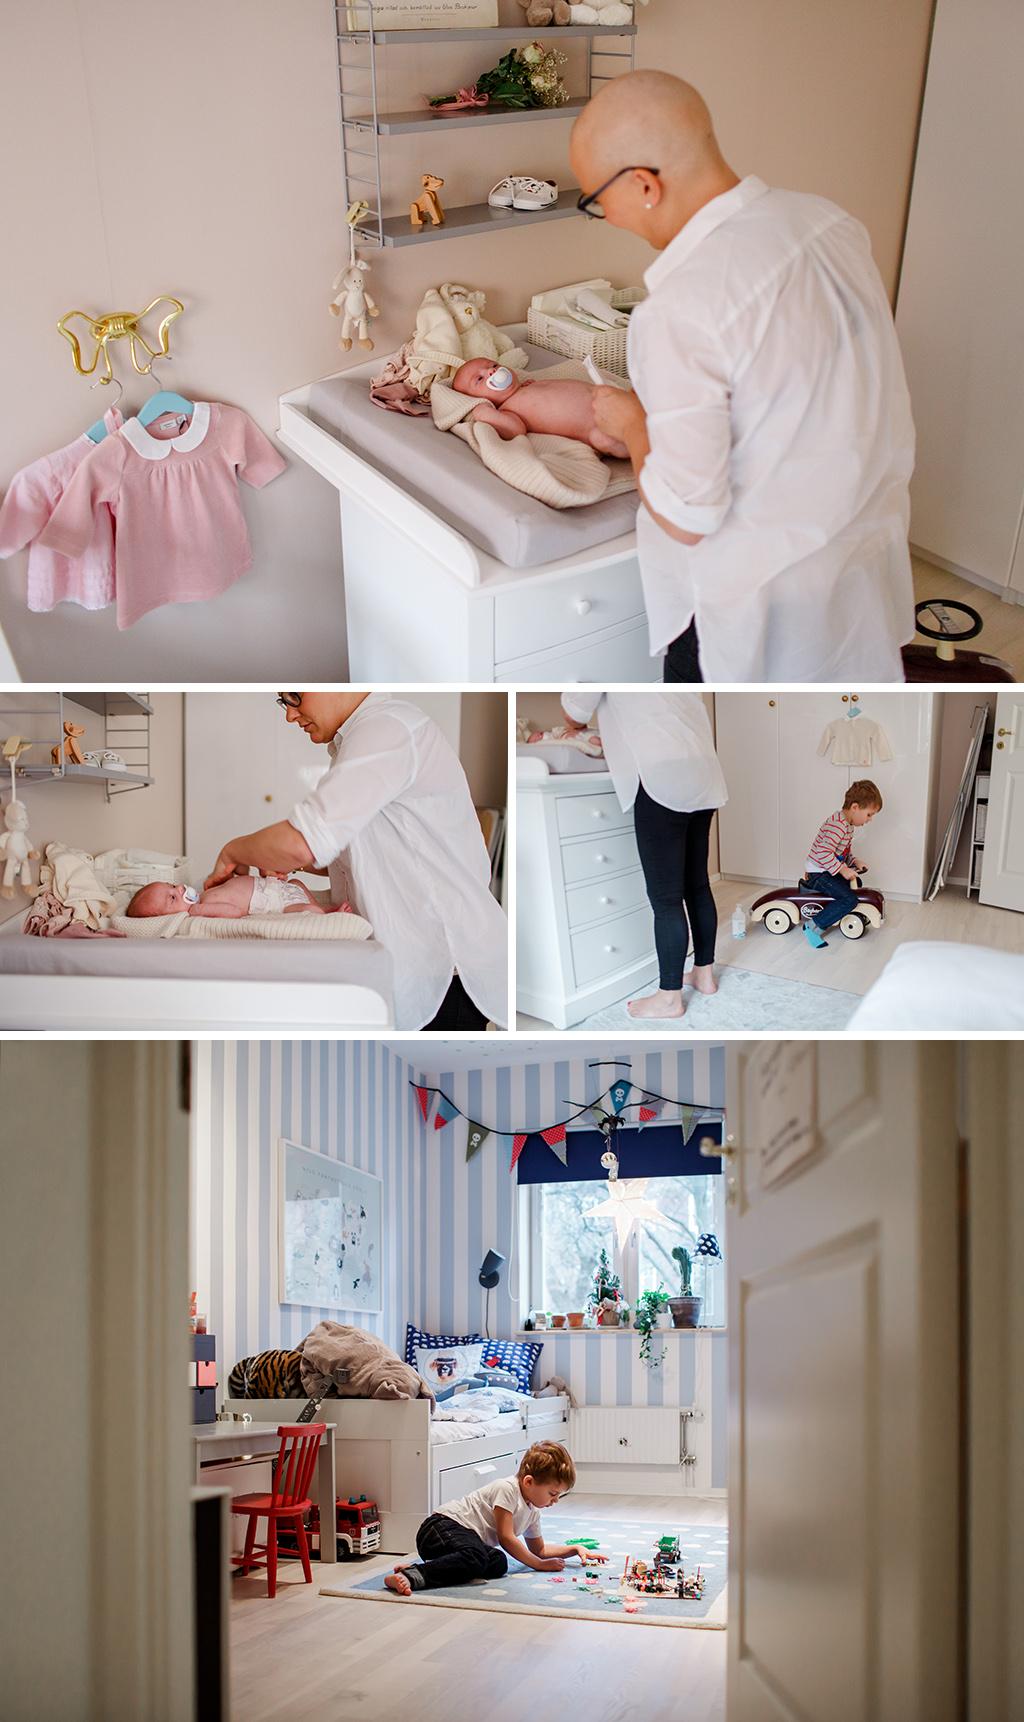 Lifestyle-nyfoddfotografering_newbornphotography_familjefotograf_Stockholm_18.jpg